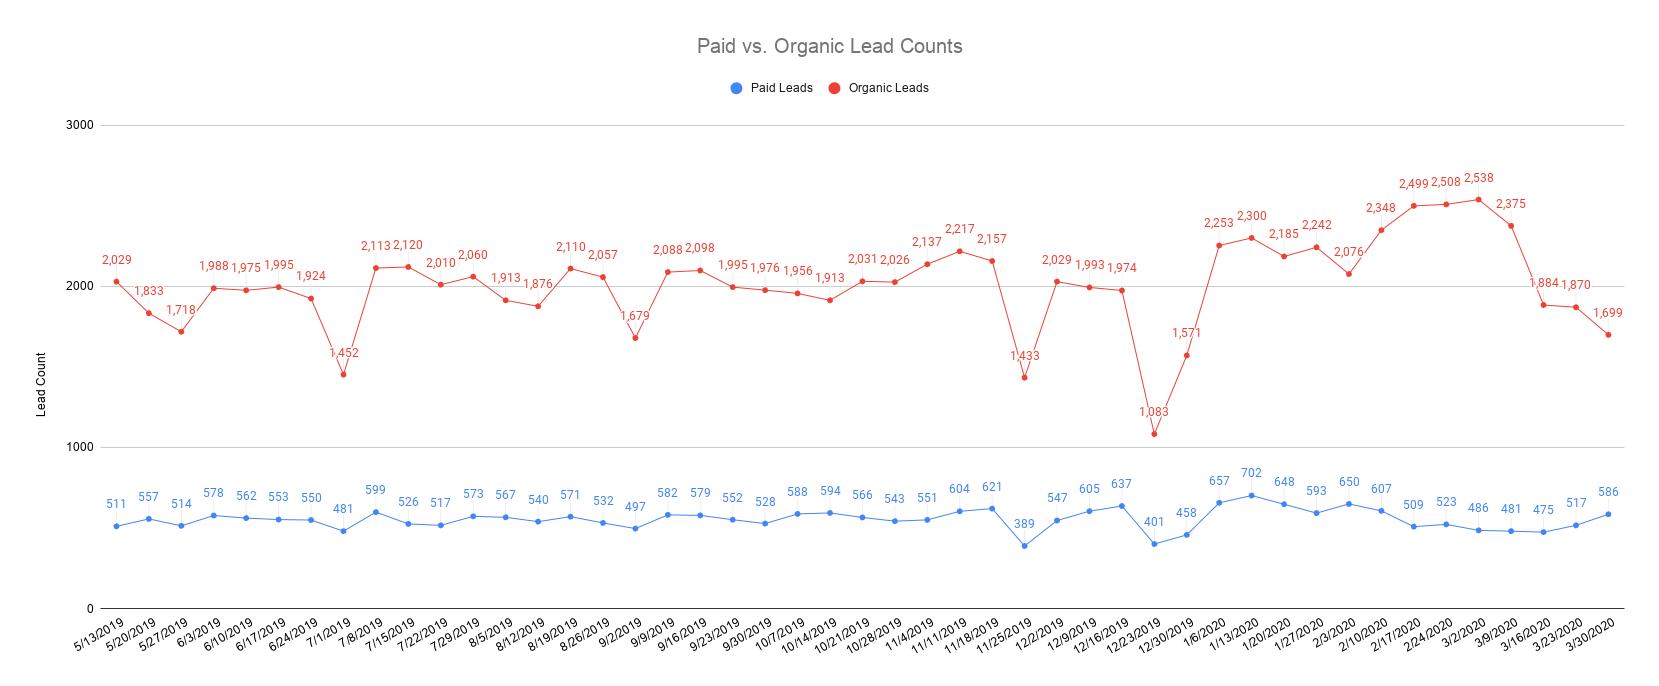 Paid vs. Organic Lead Counts